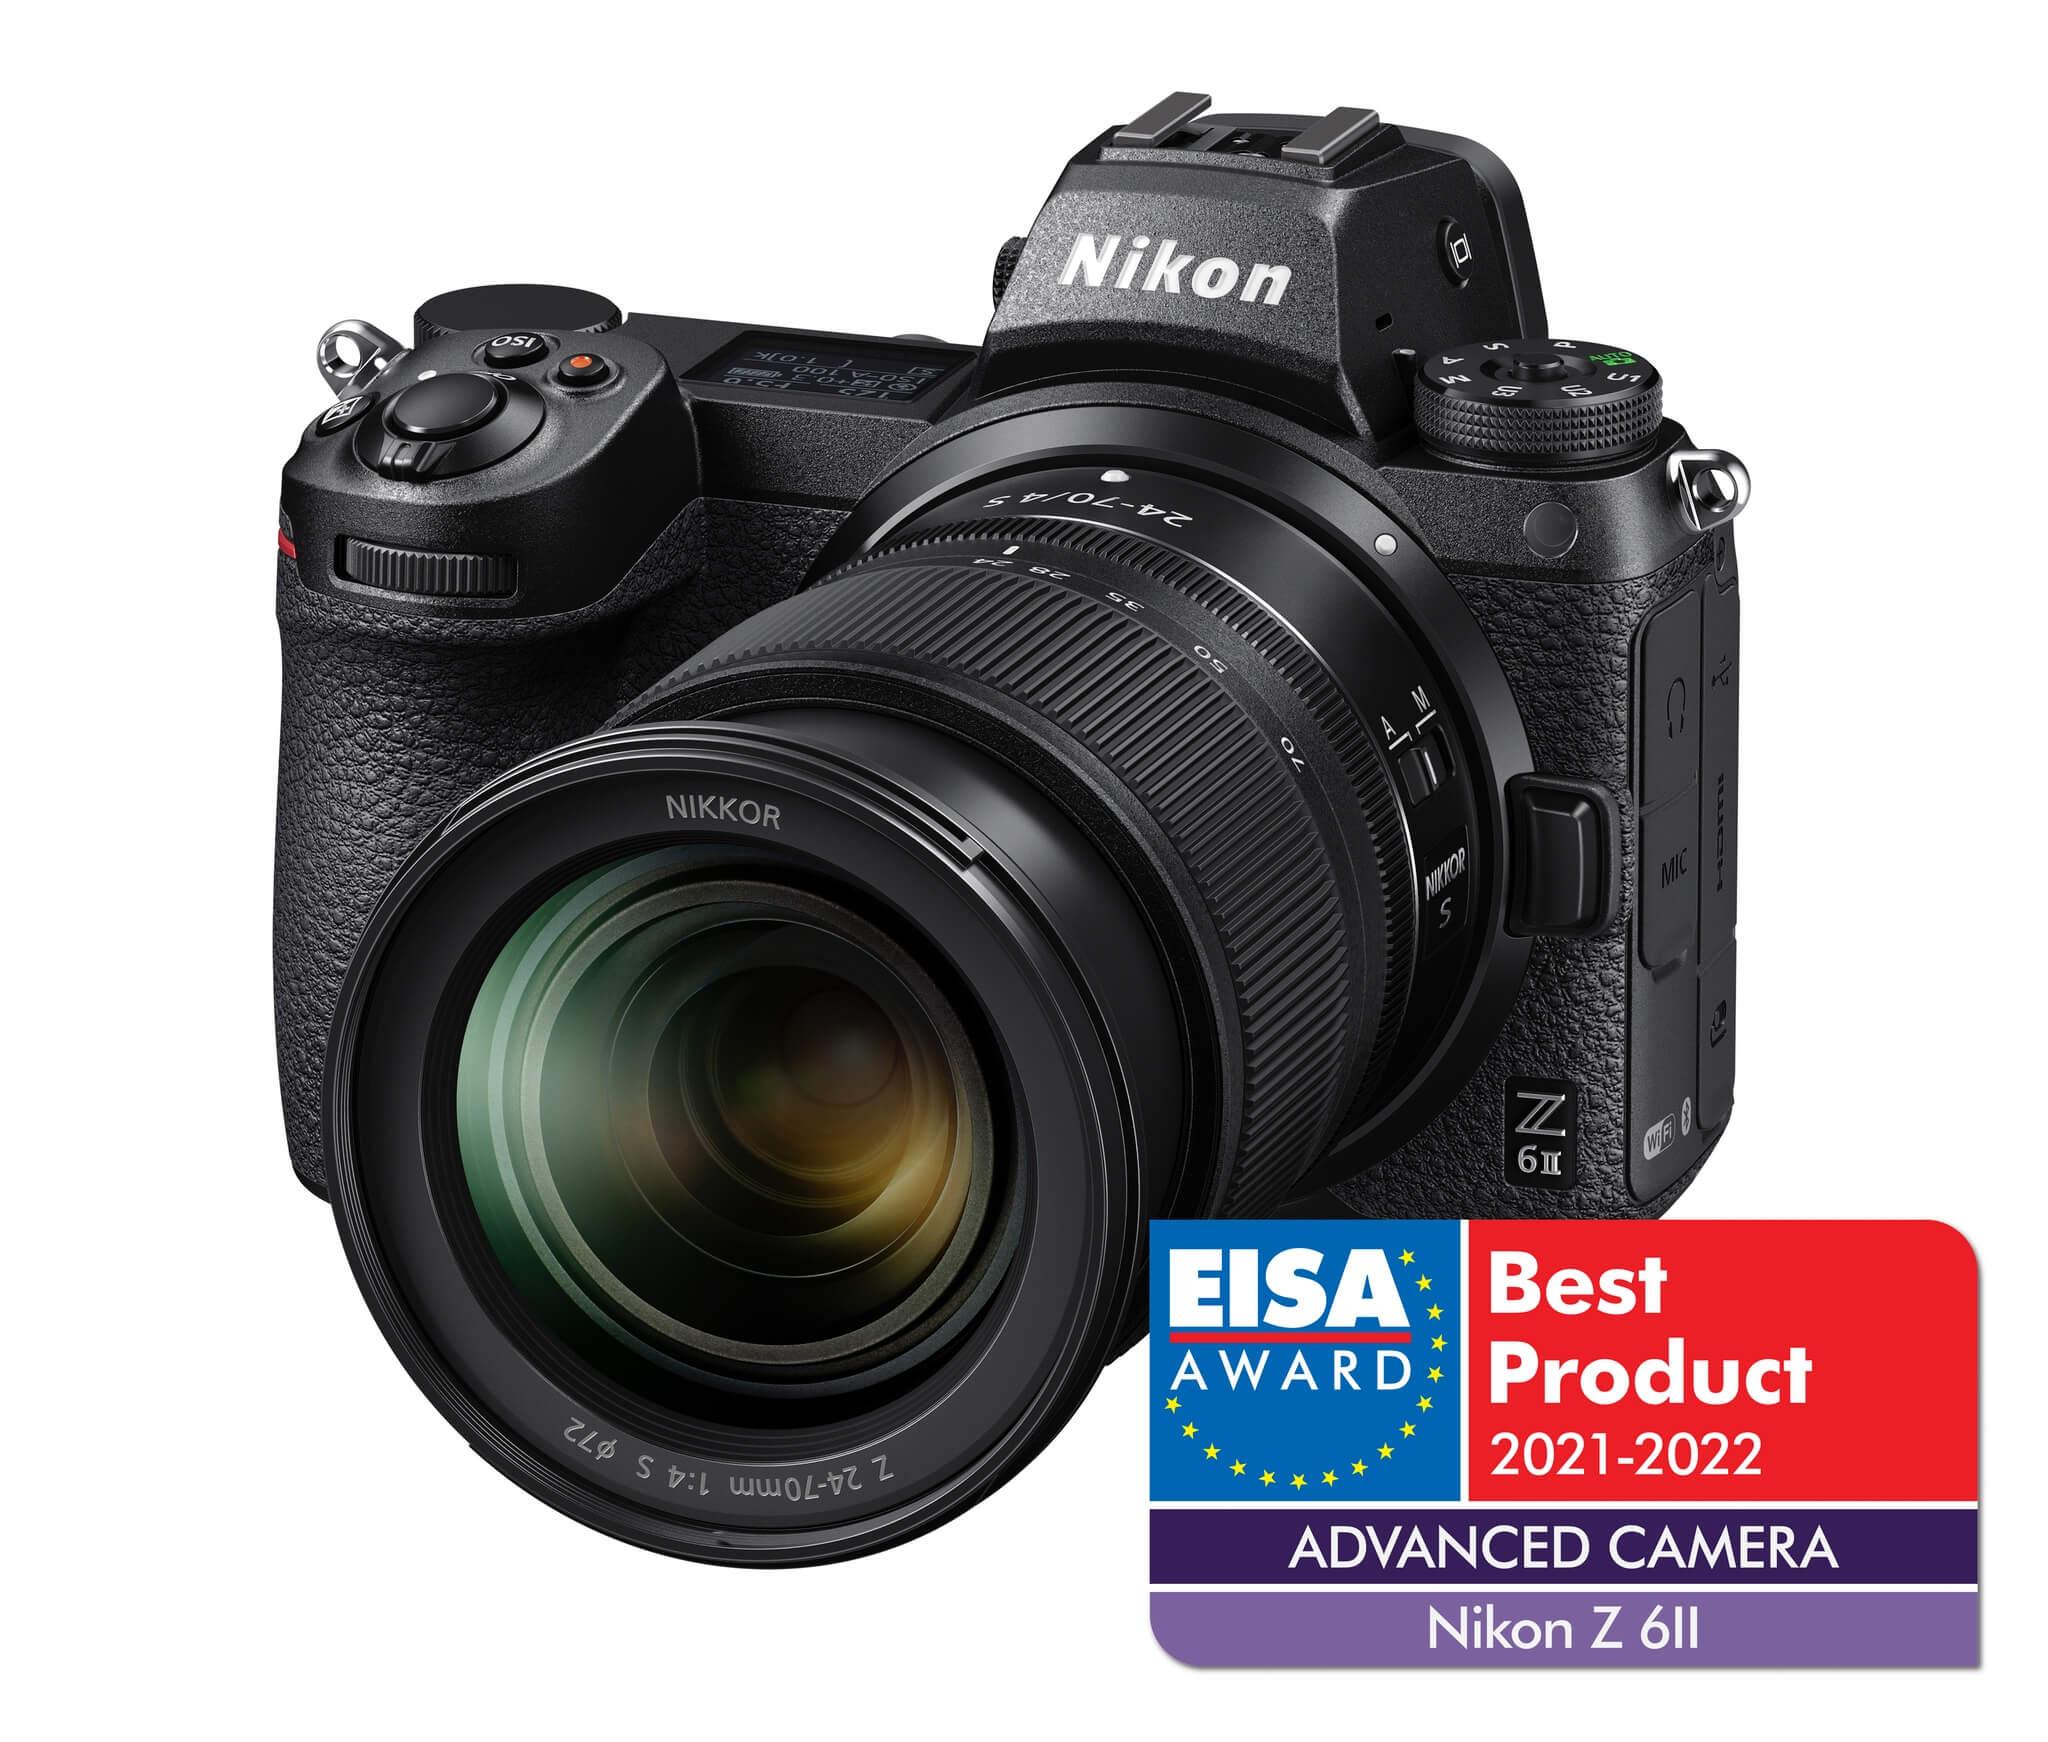 Nikon Z 6 II –EISA 2021-2022 –Advanced camera